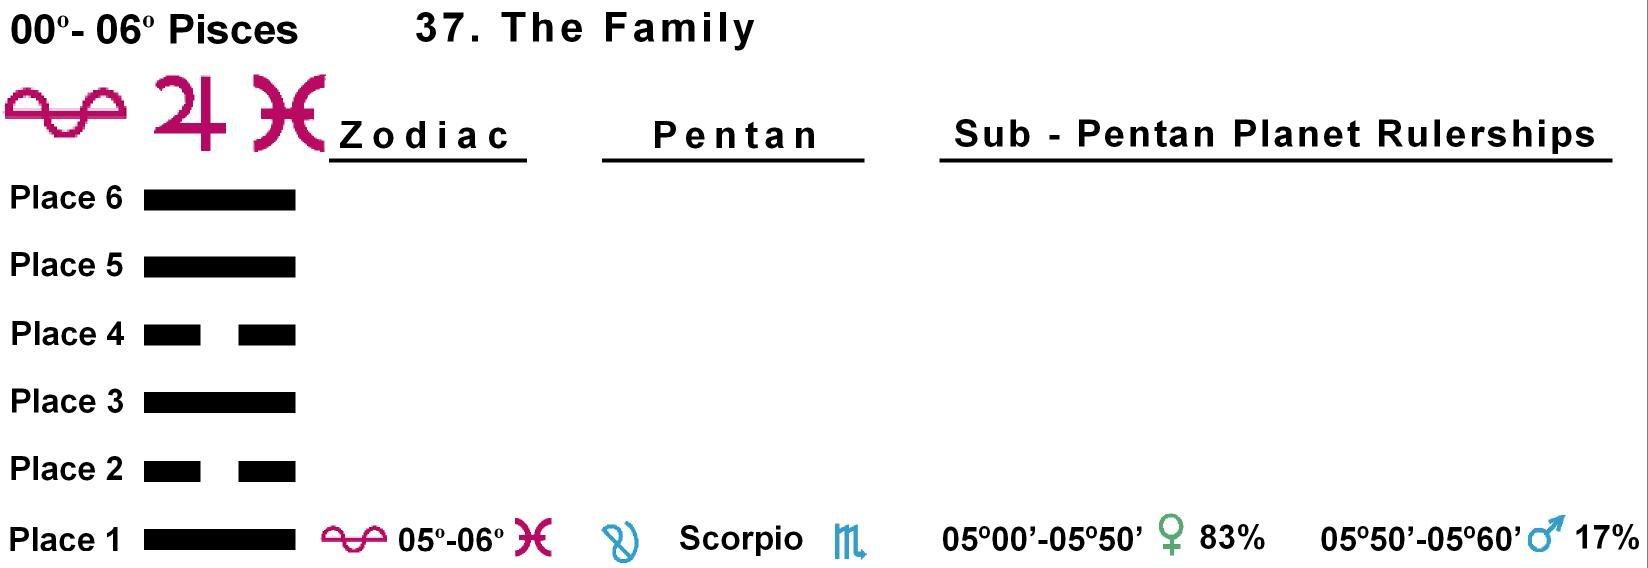 Pent-lines-12PI 05-06 Hx-37 The Family